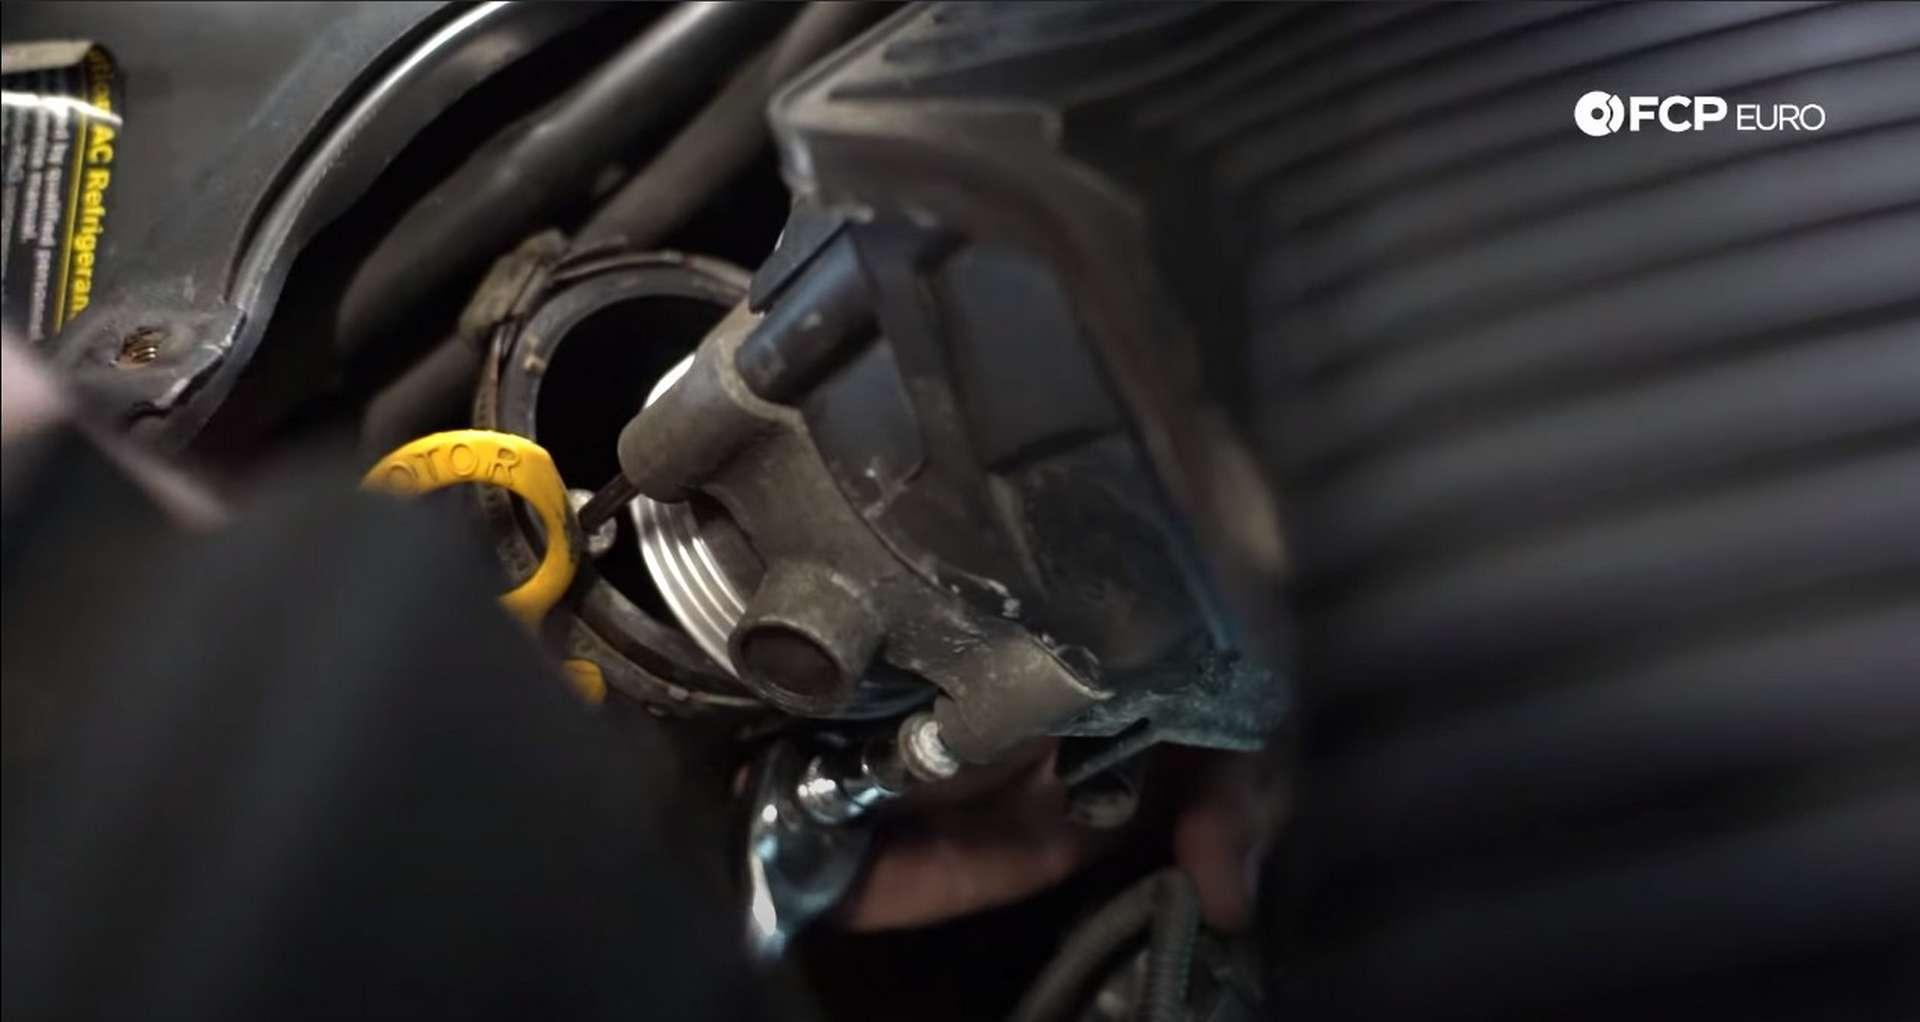 DIY Volvo Alternator and Serpentine Belt Replacement reinstalling the throttle body